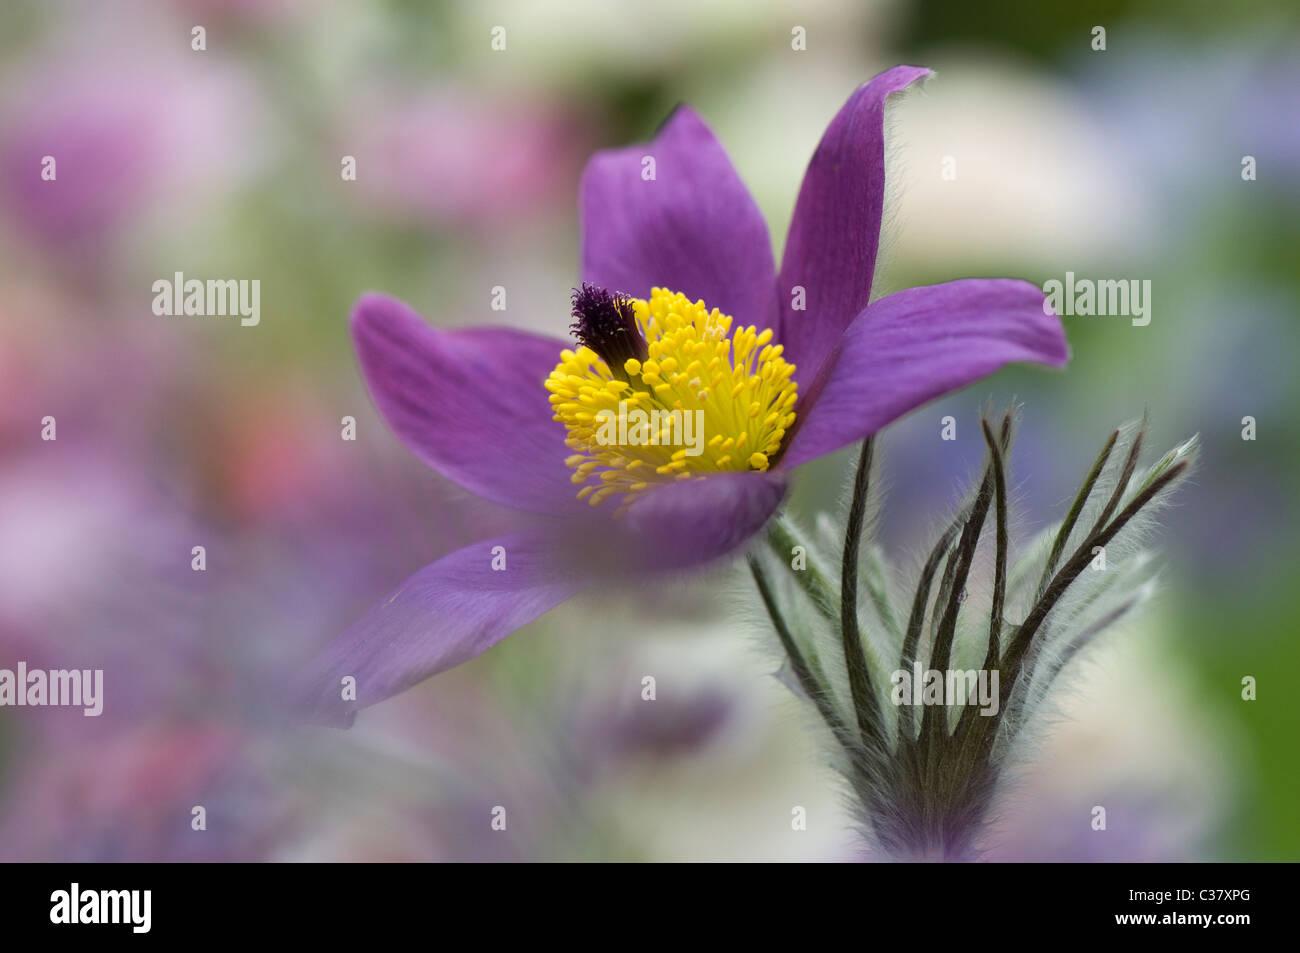 A single purple flower head of Pulsatilla vulgaris - Pasque flower, pasqueflower - Stock Image